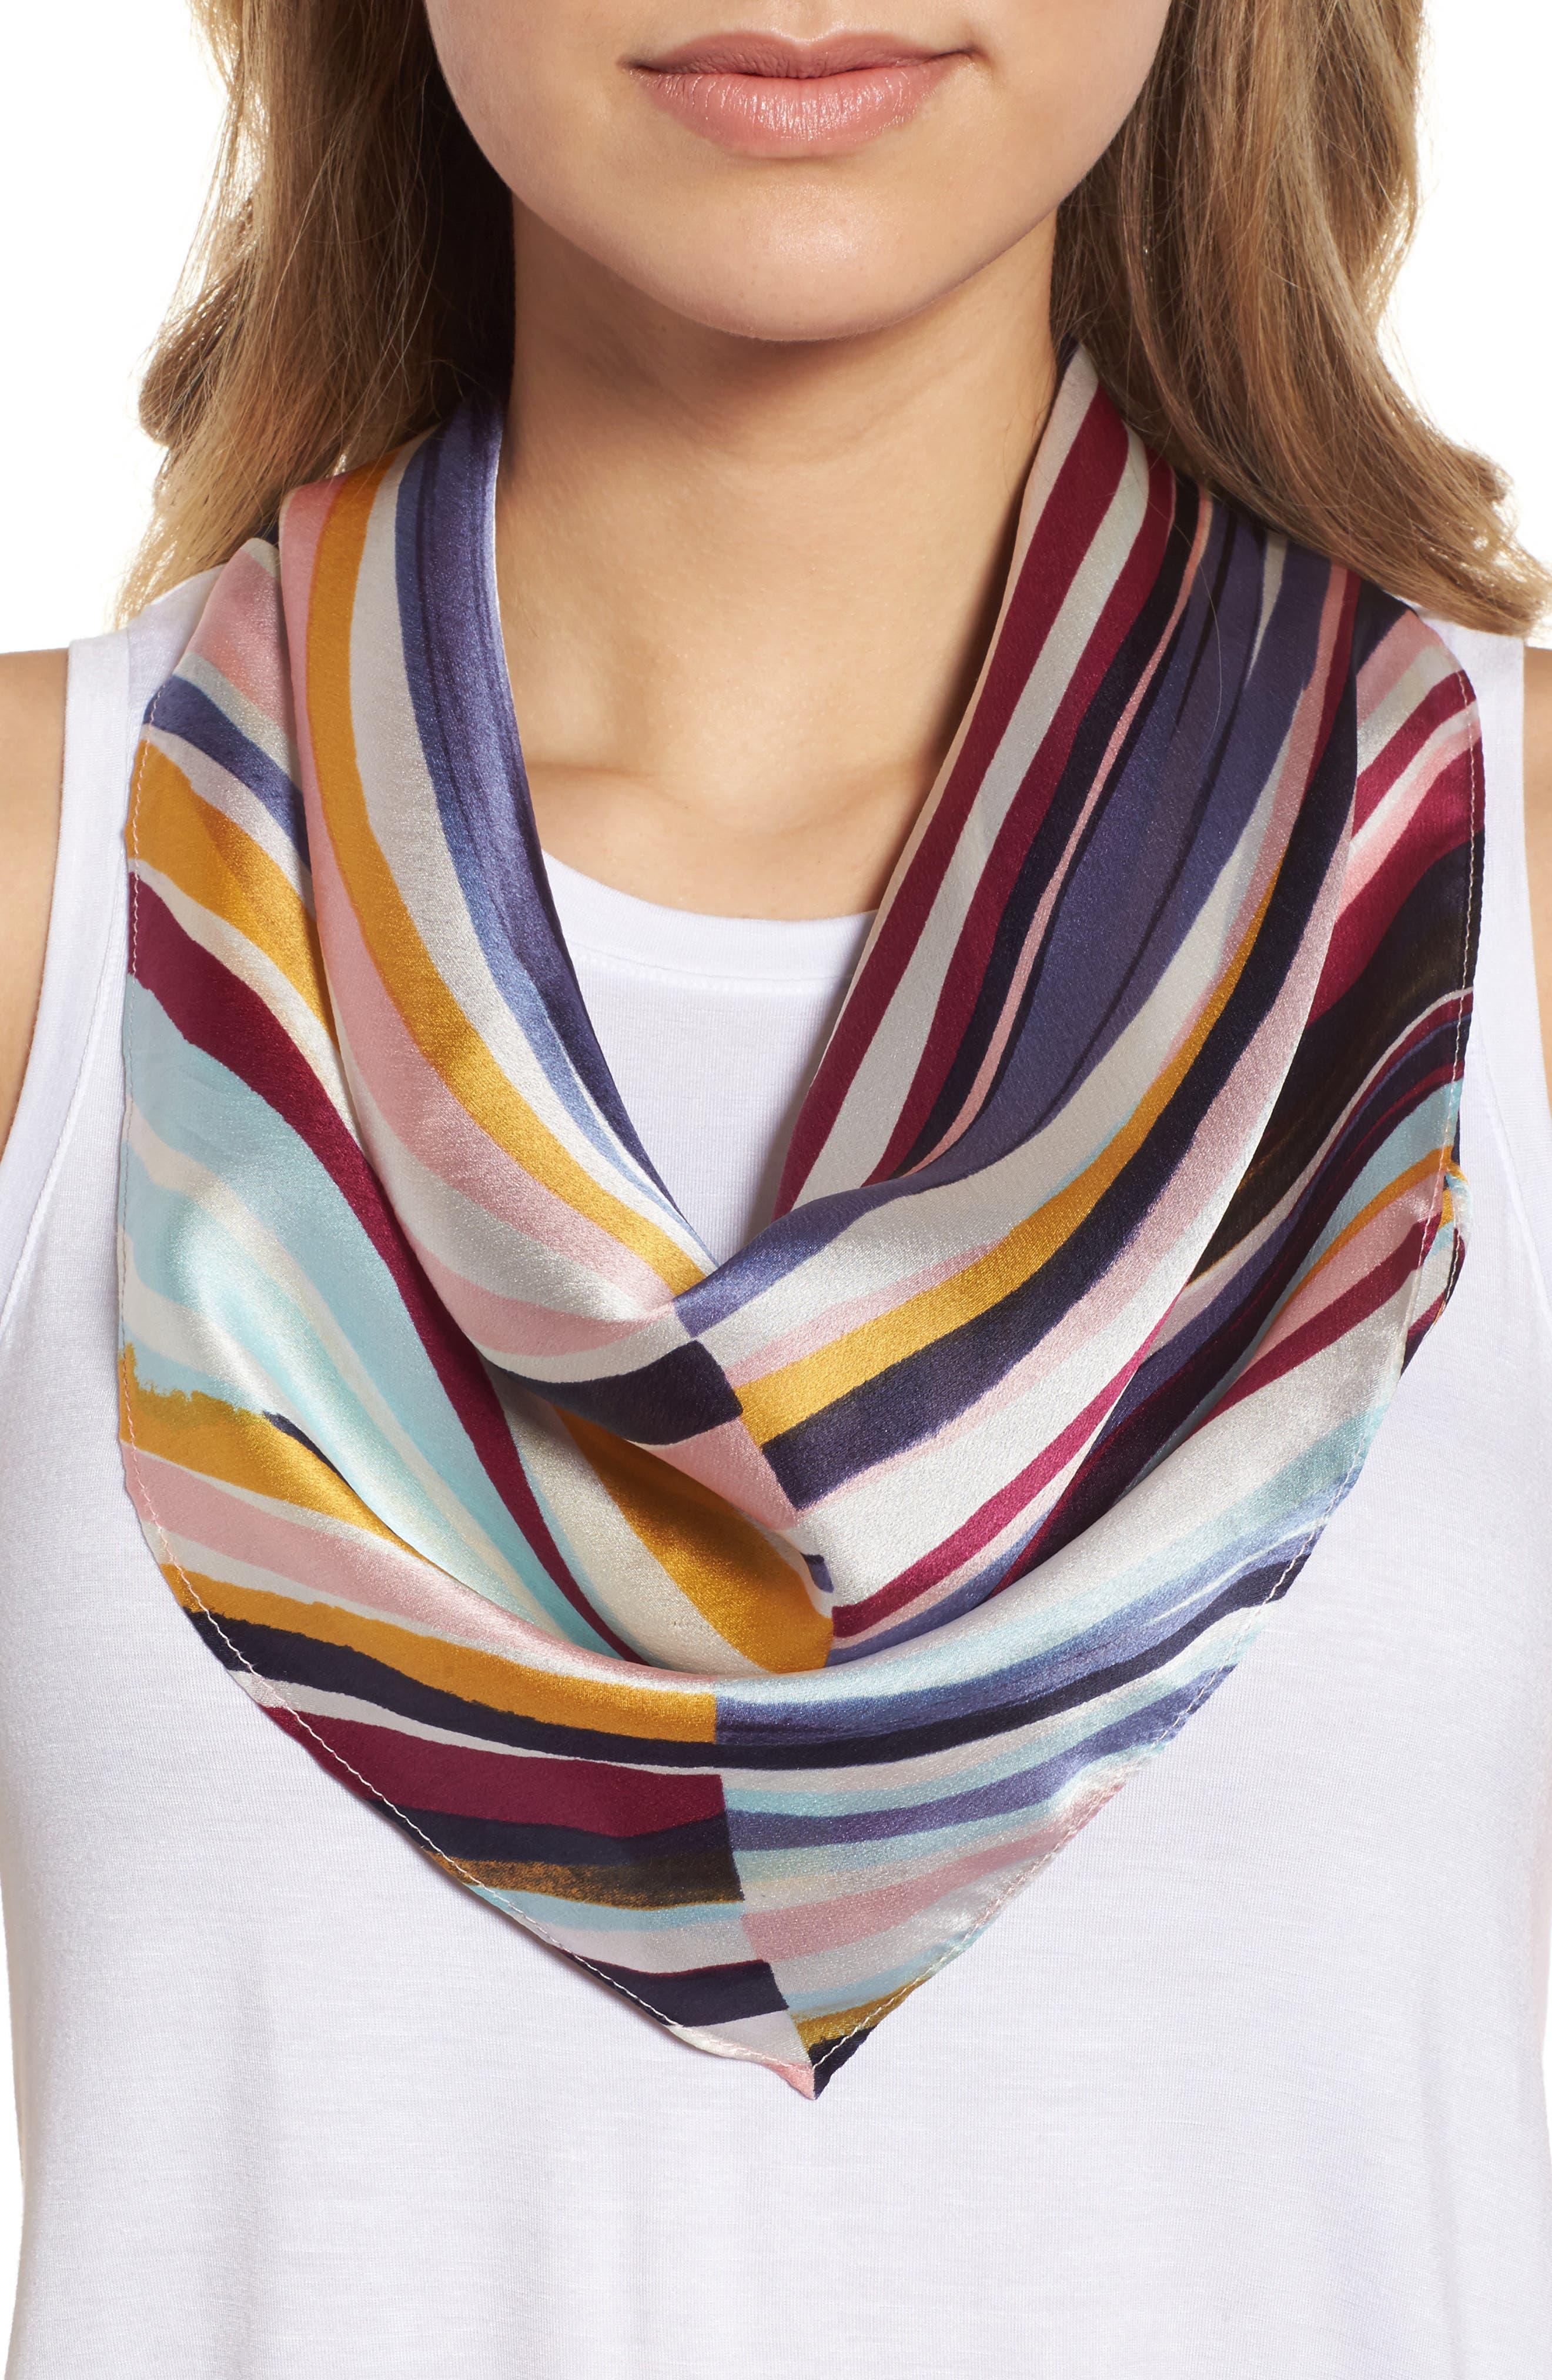 Print Silk Scarf,                             Main thumbnail 1, color,                             Purple Marker Mix Stripe Print